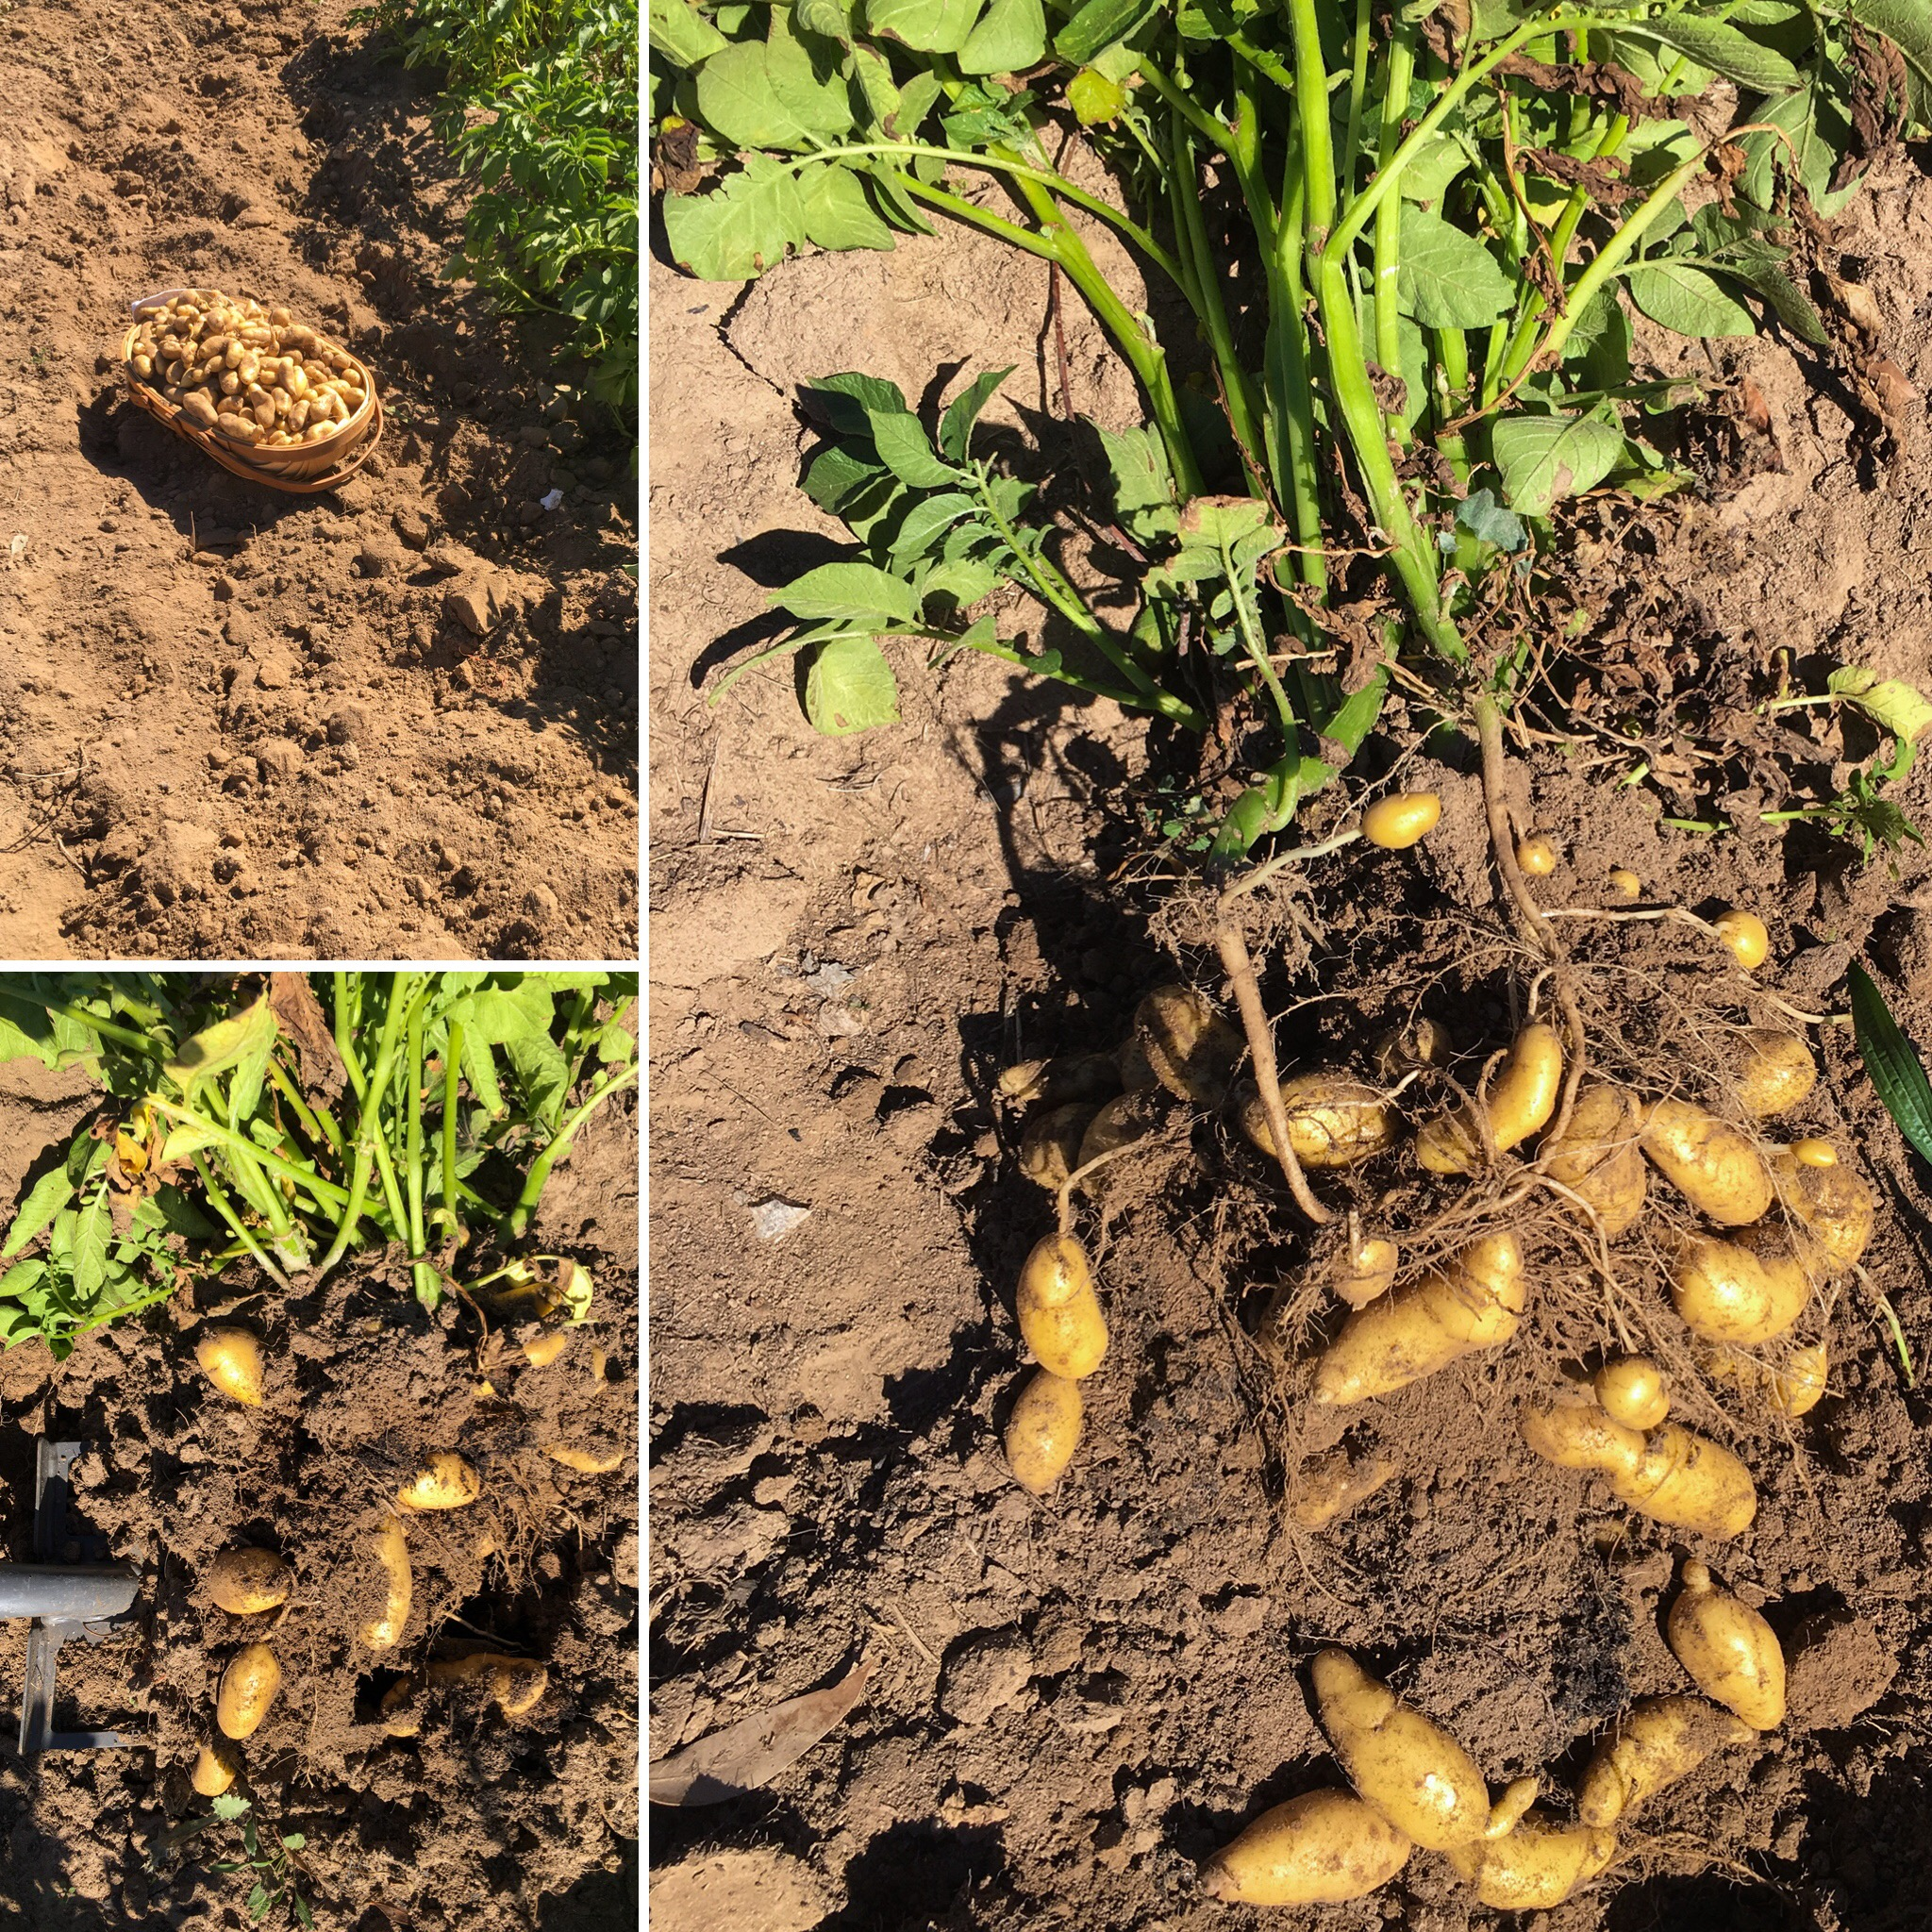 Digging up a row of Kipfler potatoes